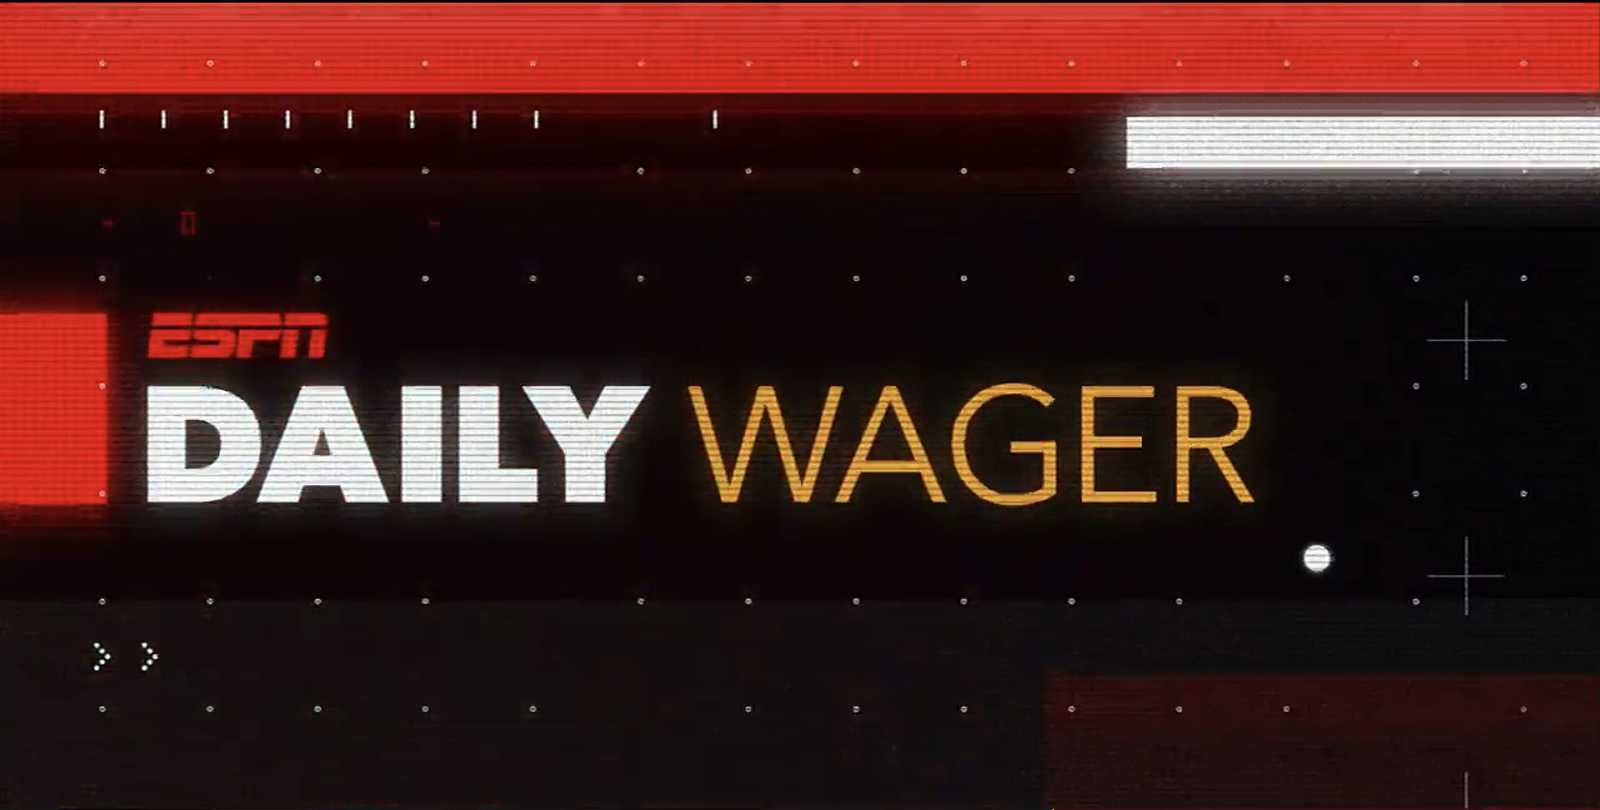 NCS_ESPN-Daily-Wager_Doug-Kezirian_0012